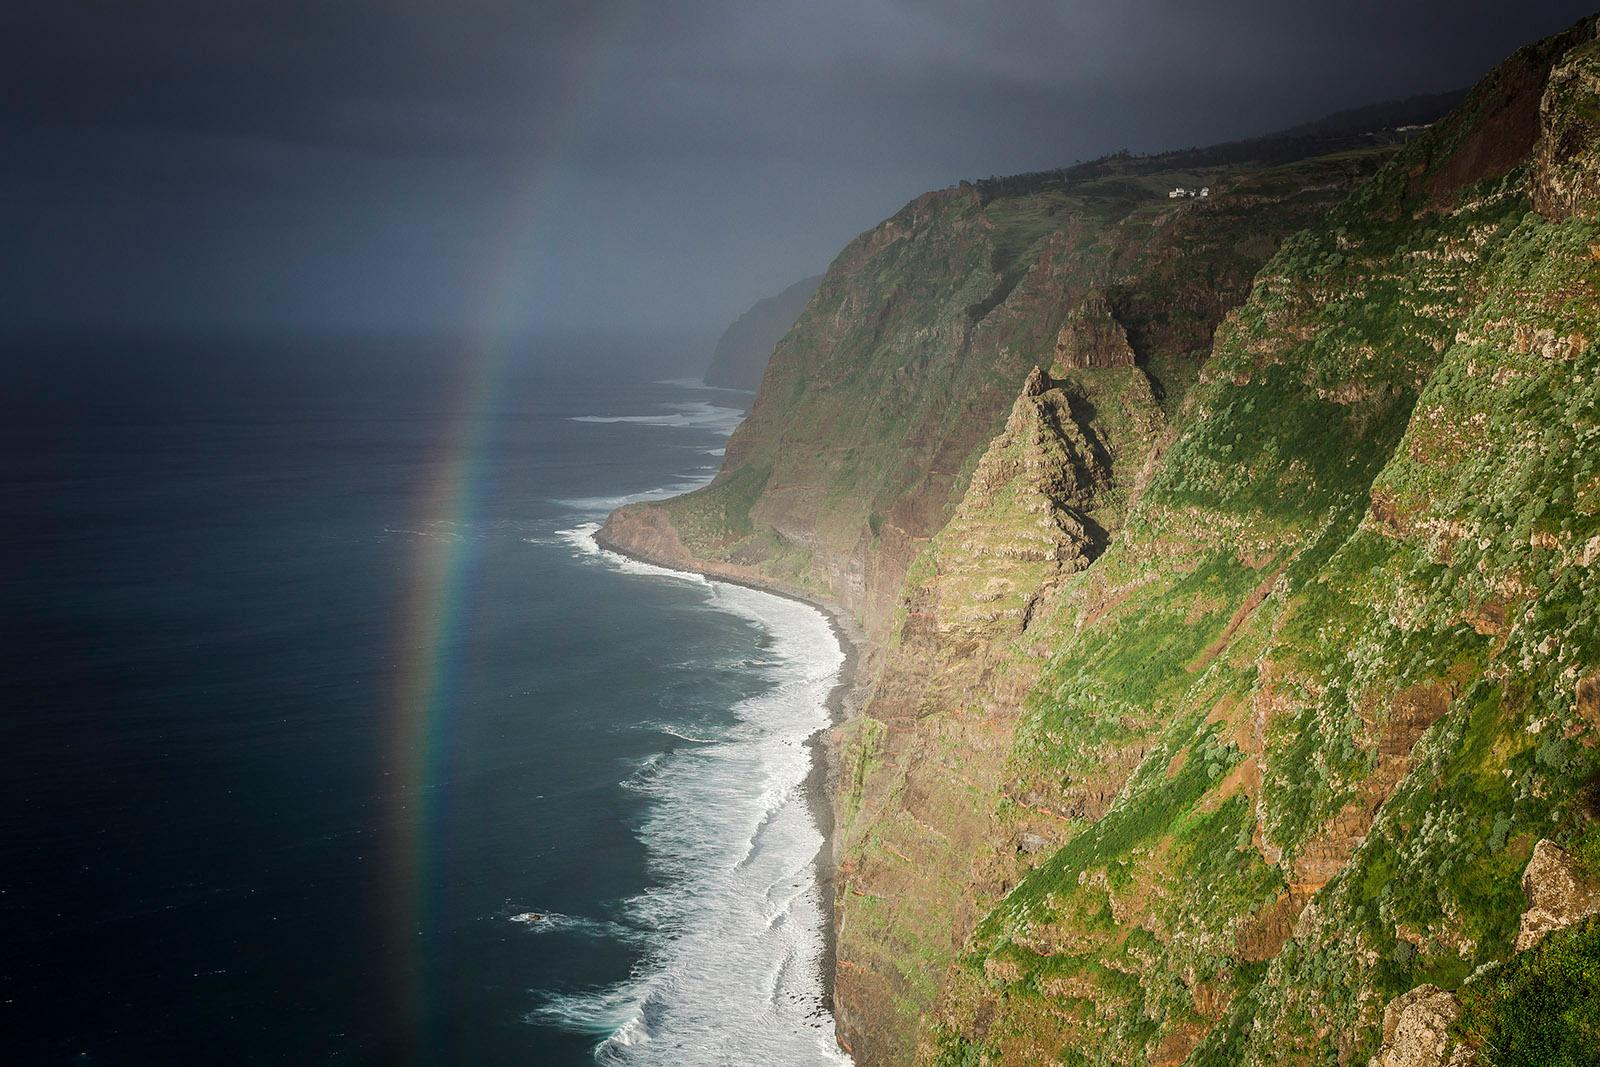 madere-madeira-island-portugal-voyage-travel-elise-julliard-photographe-photographer-cliff-falaise-arc-en-ciel-rainbow-funchal-paysage-landscape